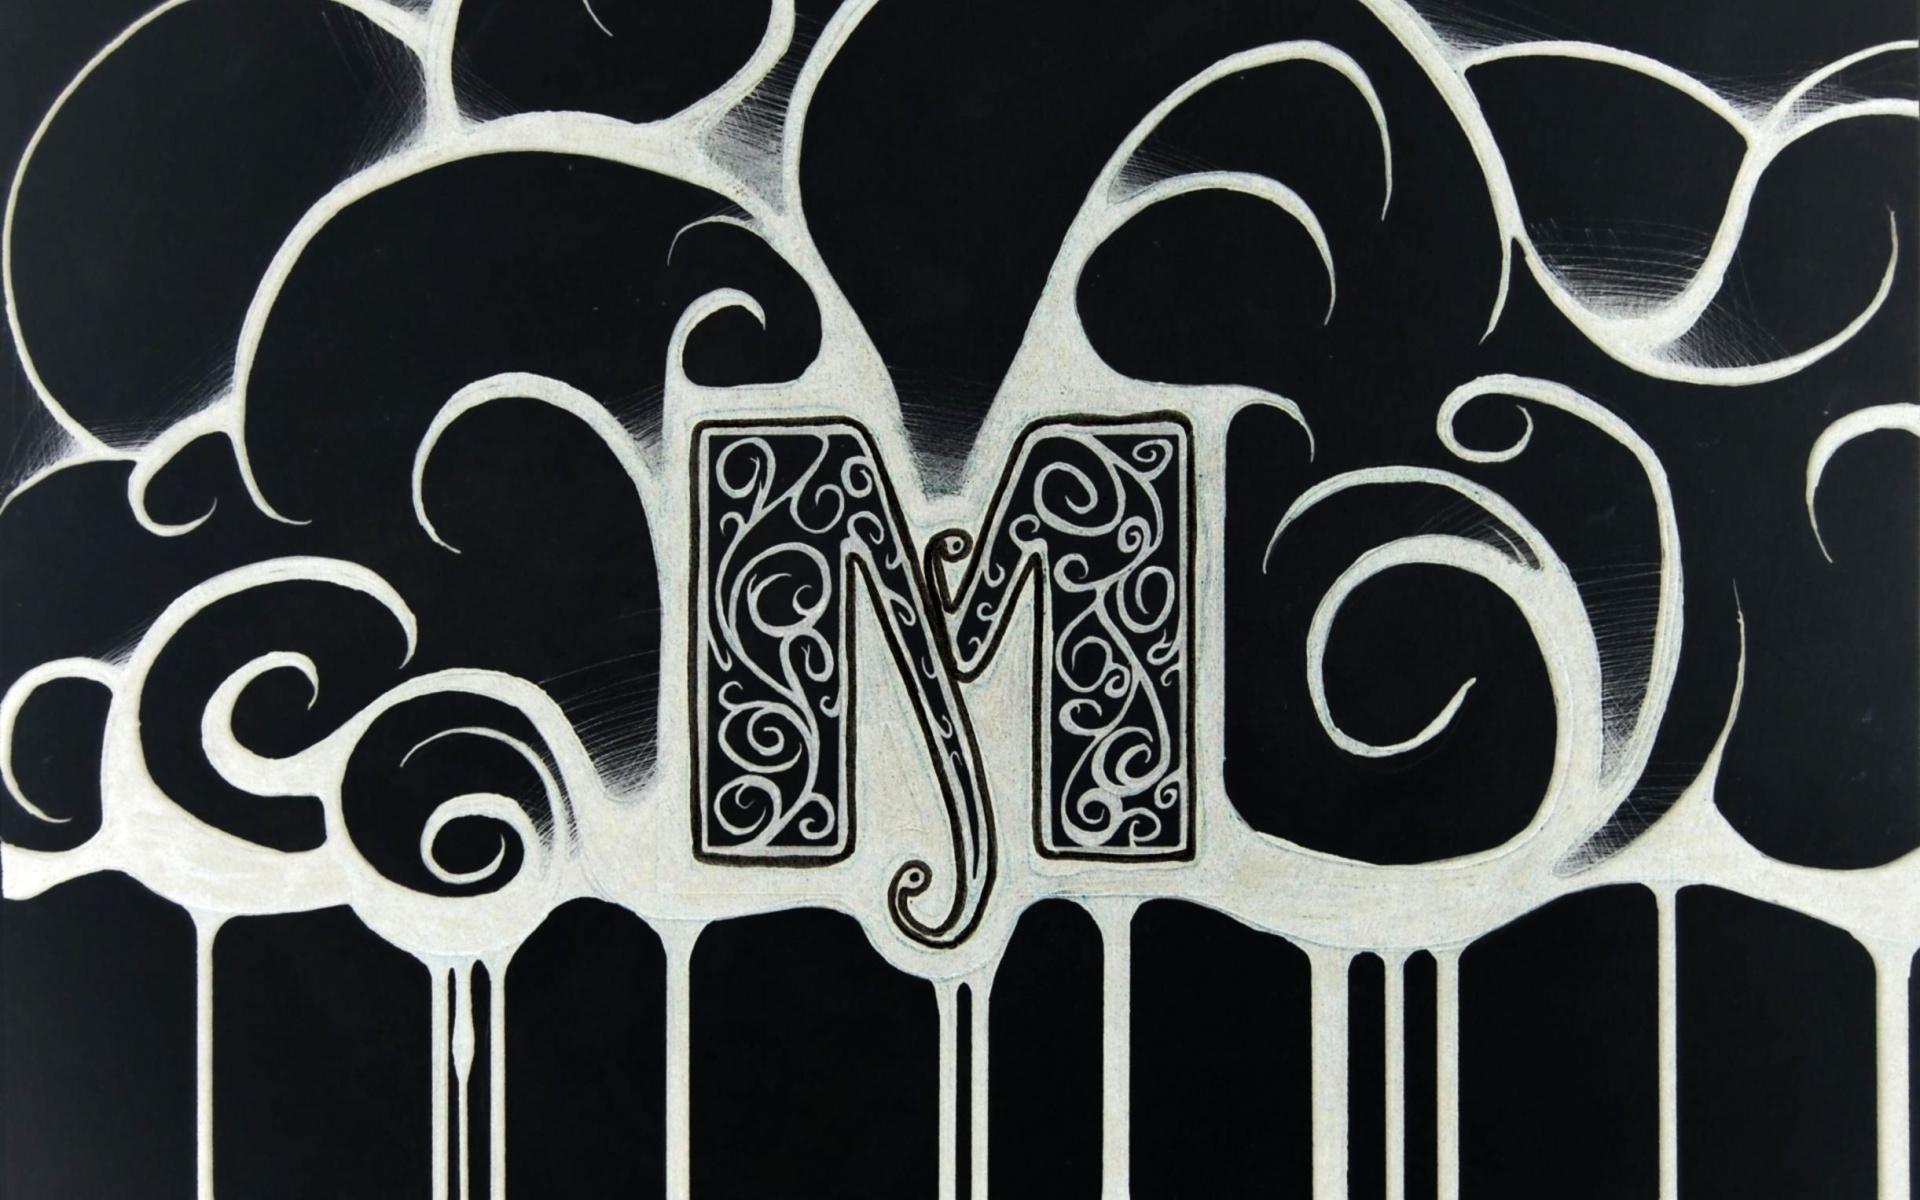 Letter m wallpapers wallpapersafari - M letter wallpapers mobile ...